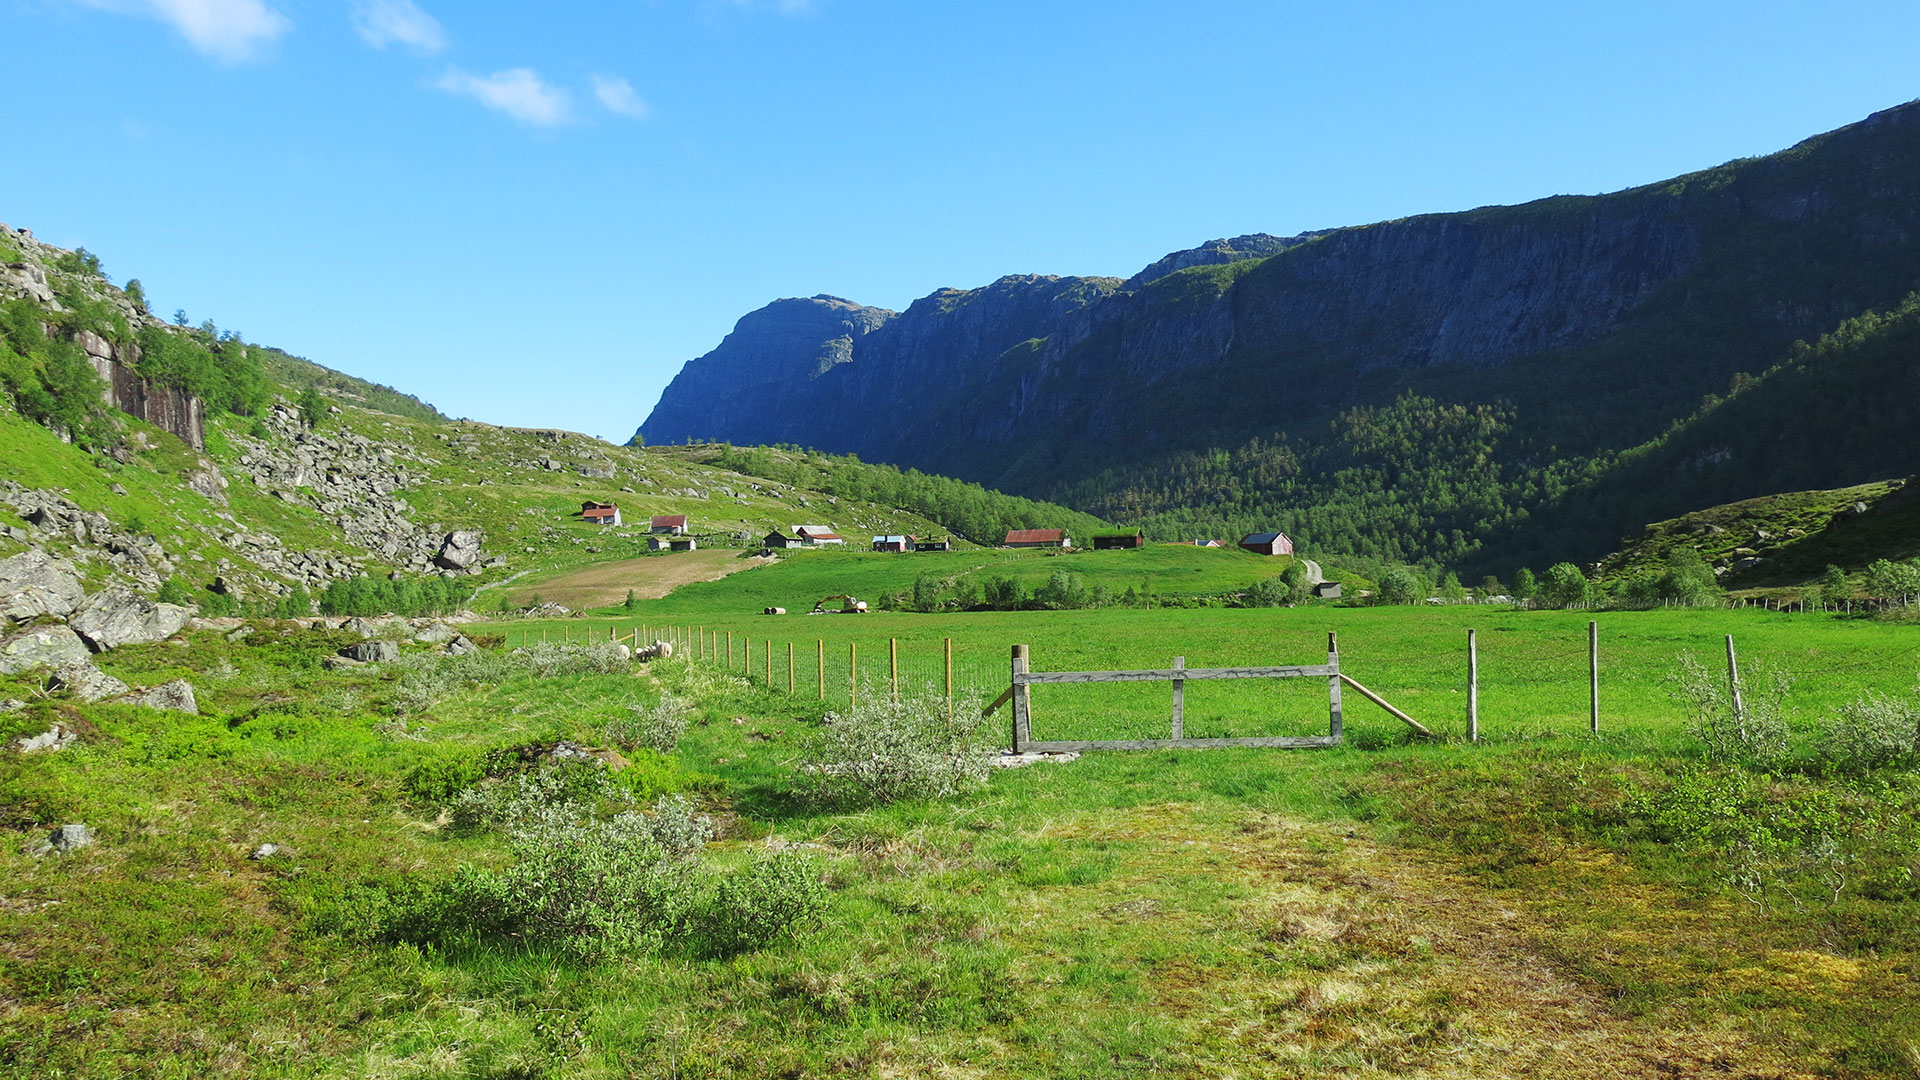 Mountain farming.